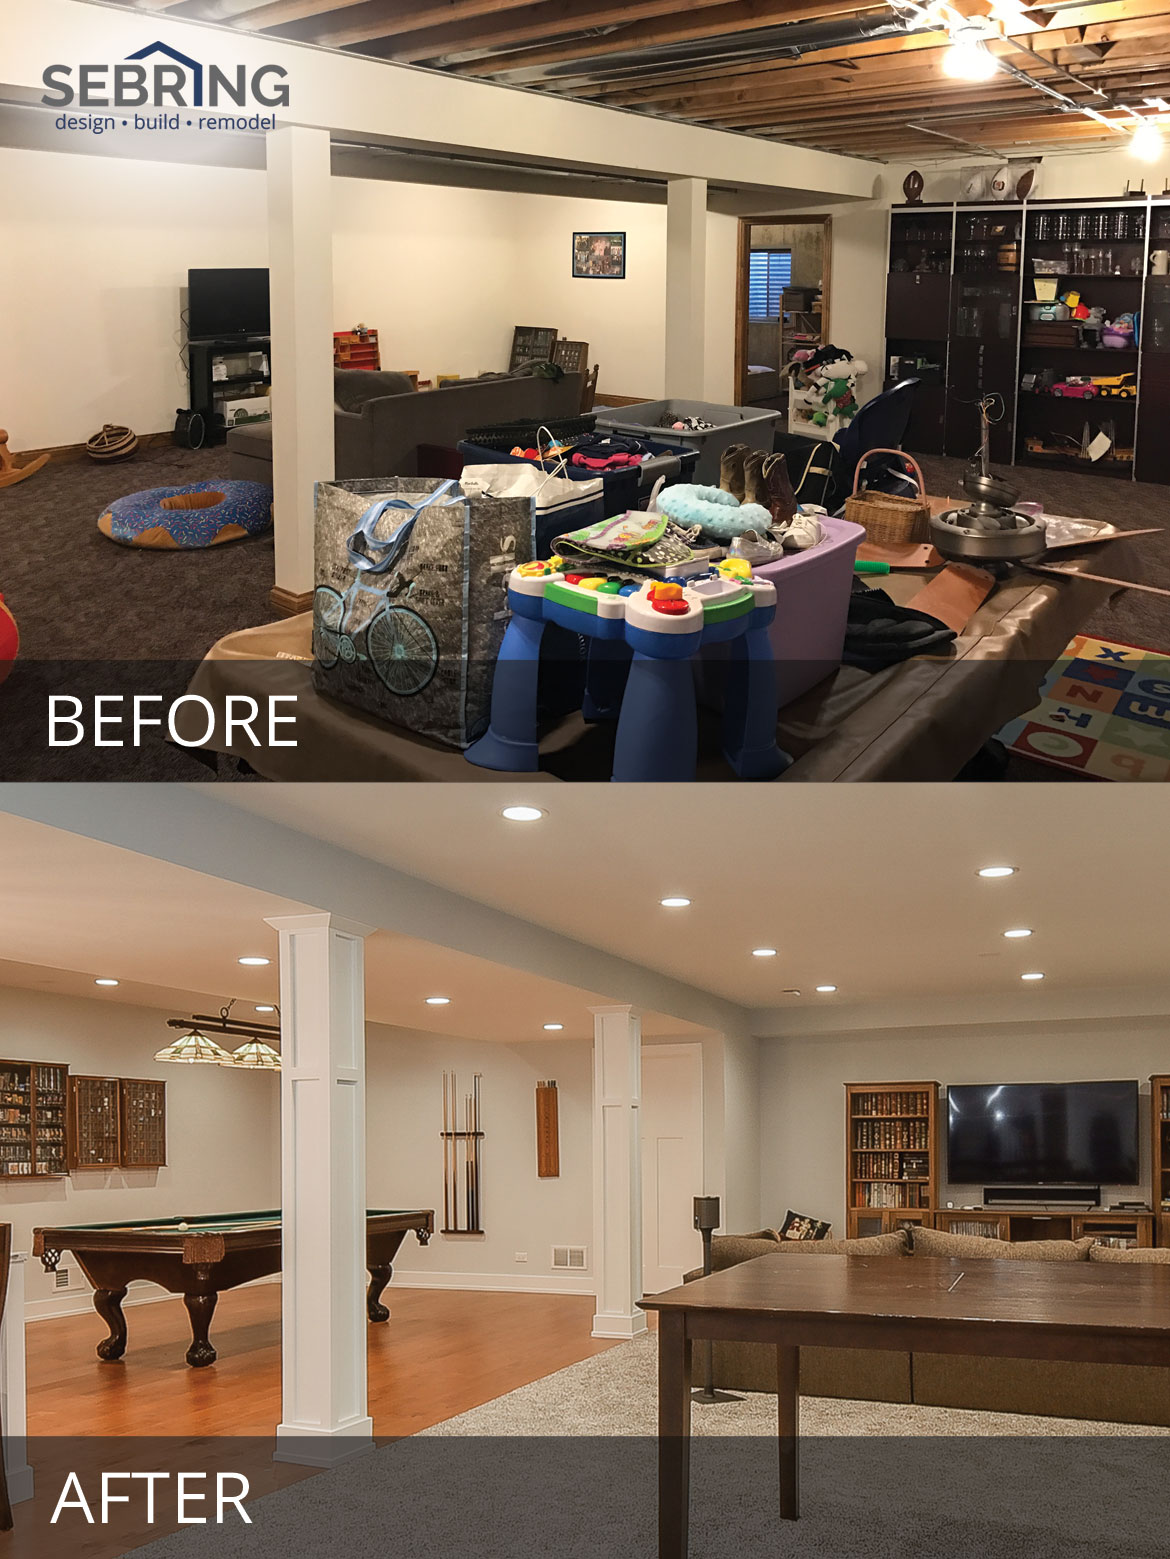 Elmhurst basement remodeling project pictures Before and After Pictures - Sebring Design Build